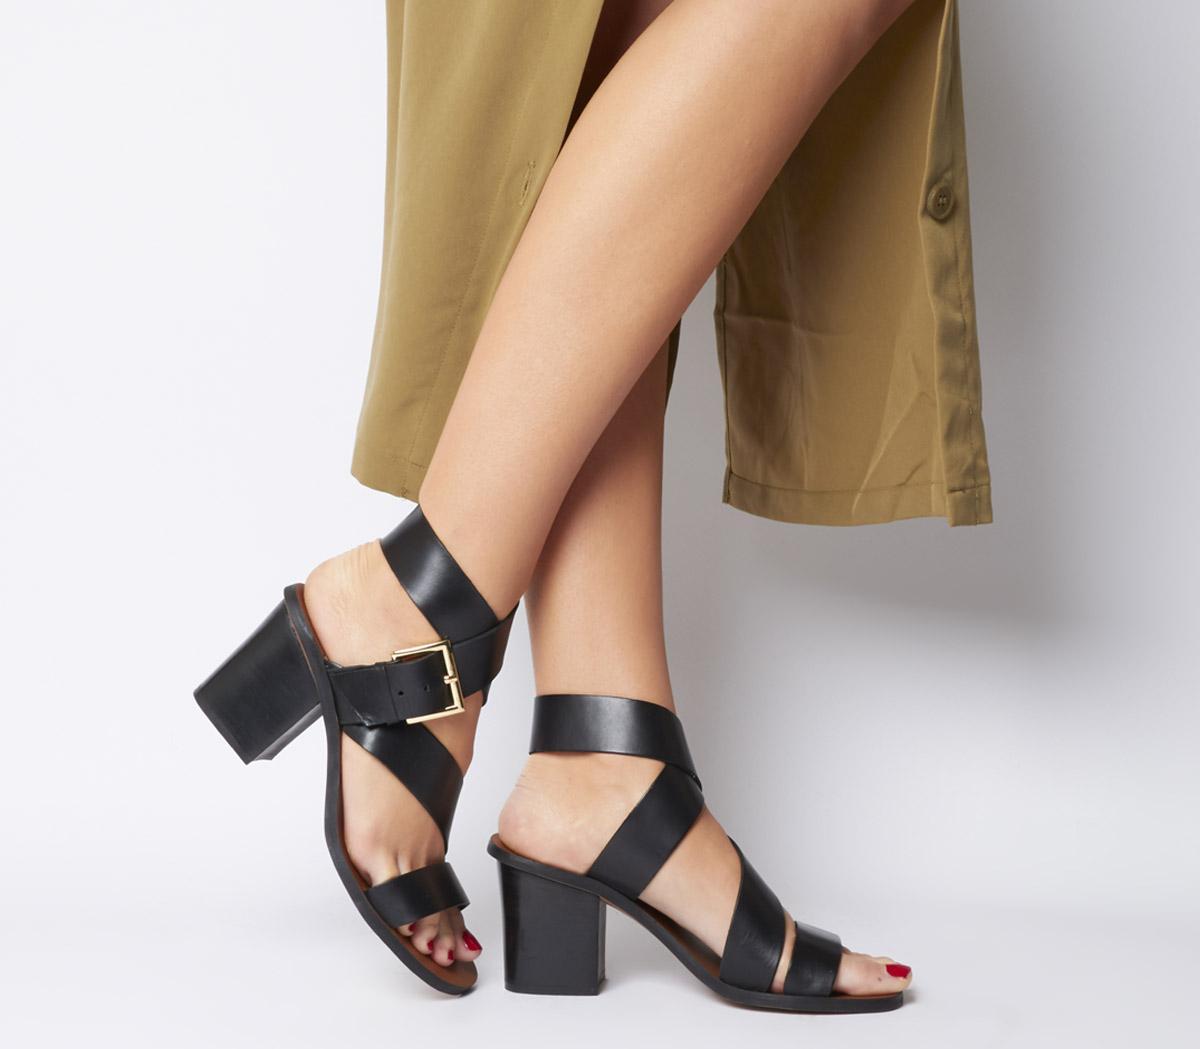 Match- Ankle Strap Block Heel Sandal Black Leather